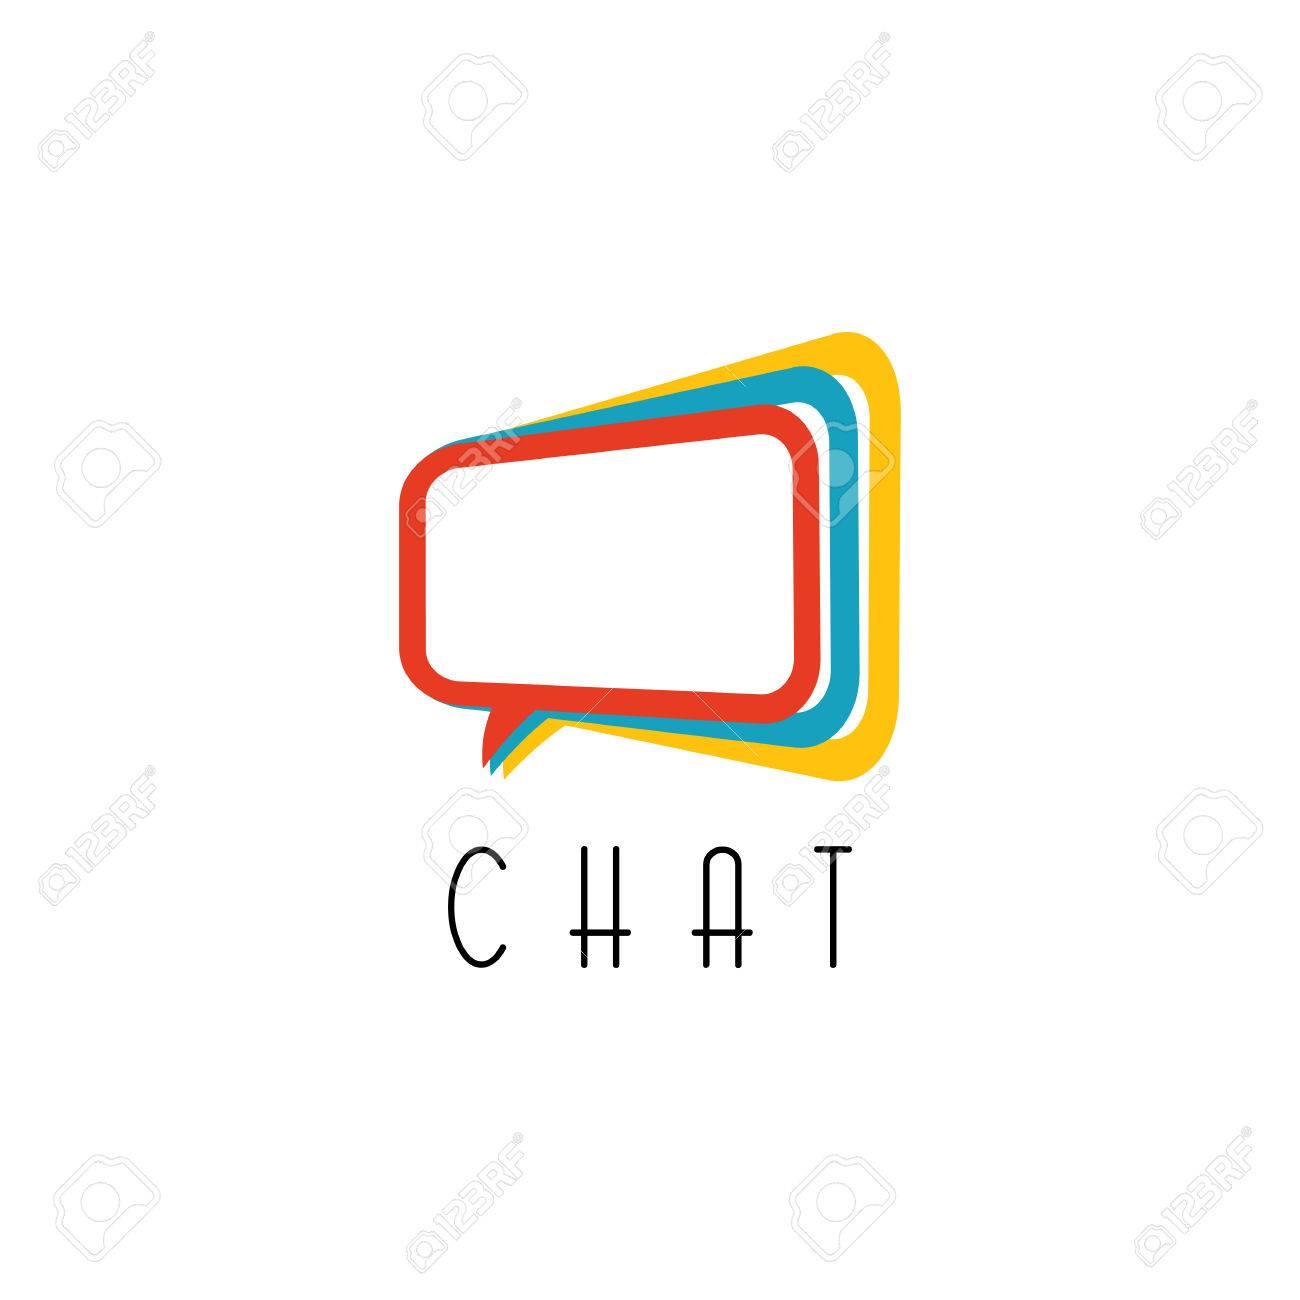 Chat logo. talking concept, idea communication technology sign - 38977882